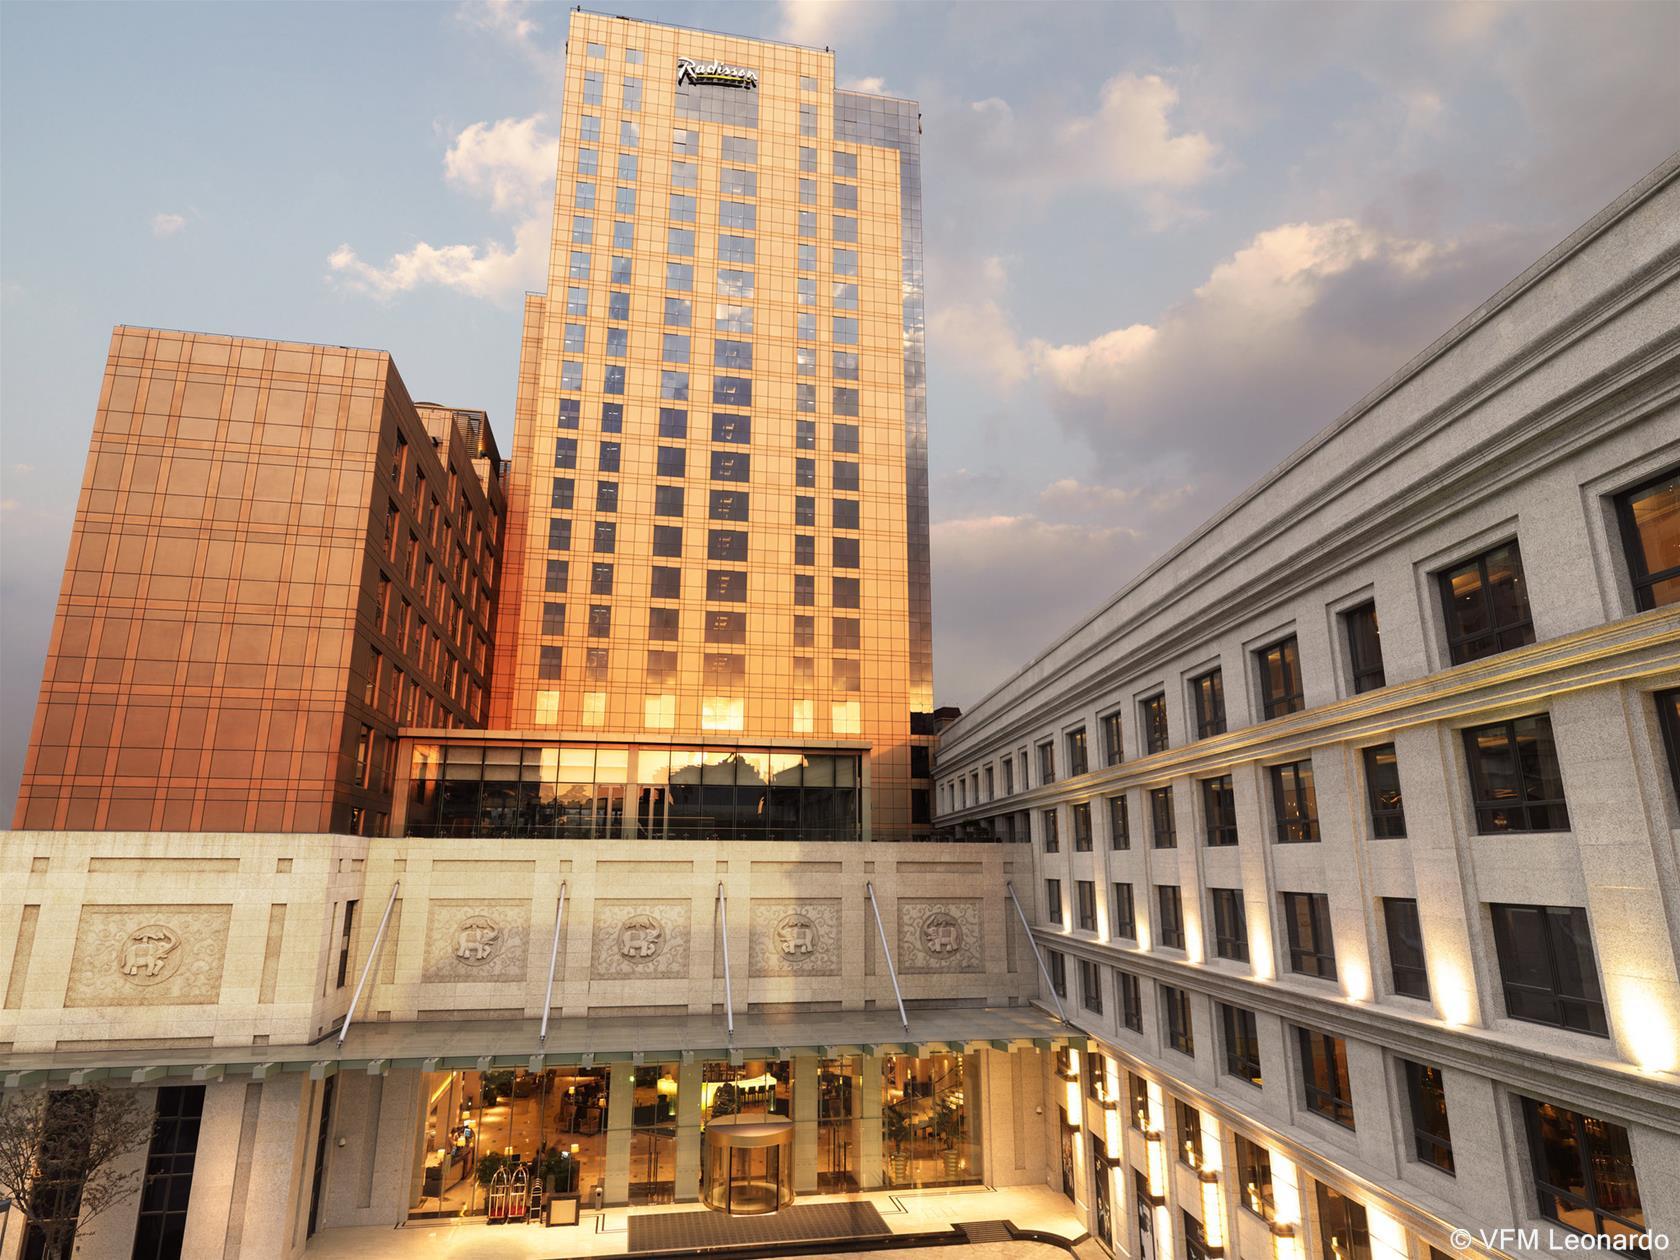 Hotel Radisson Hong Quan